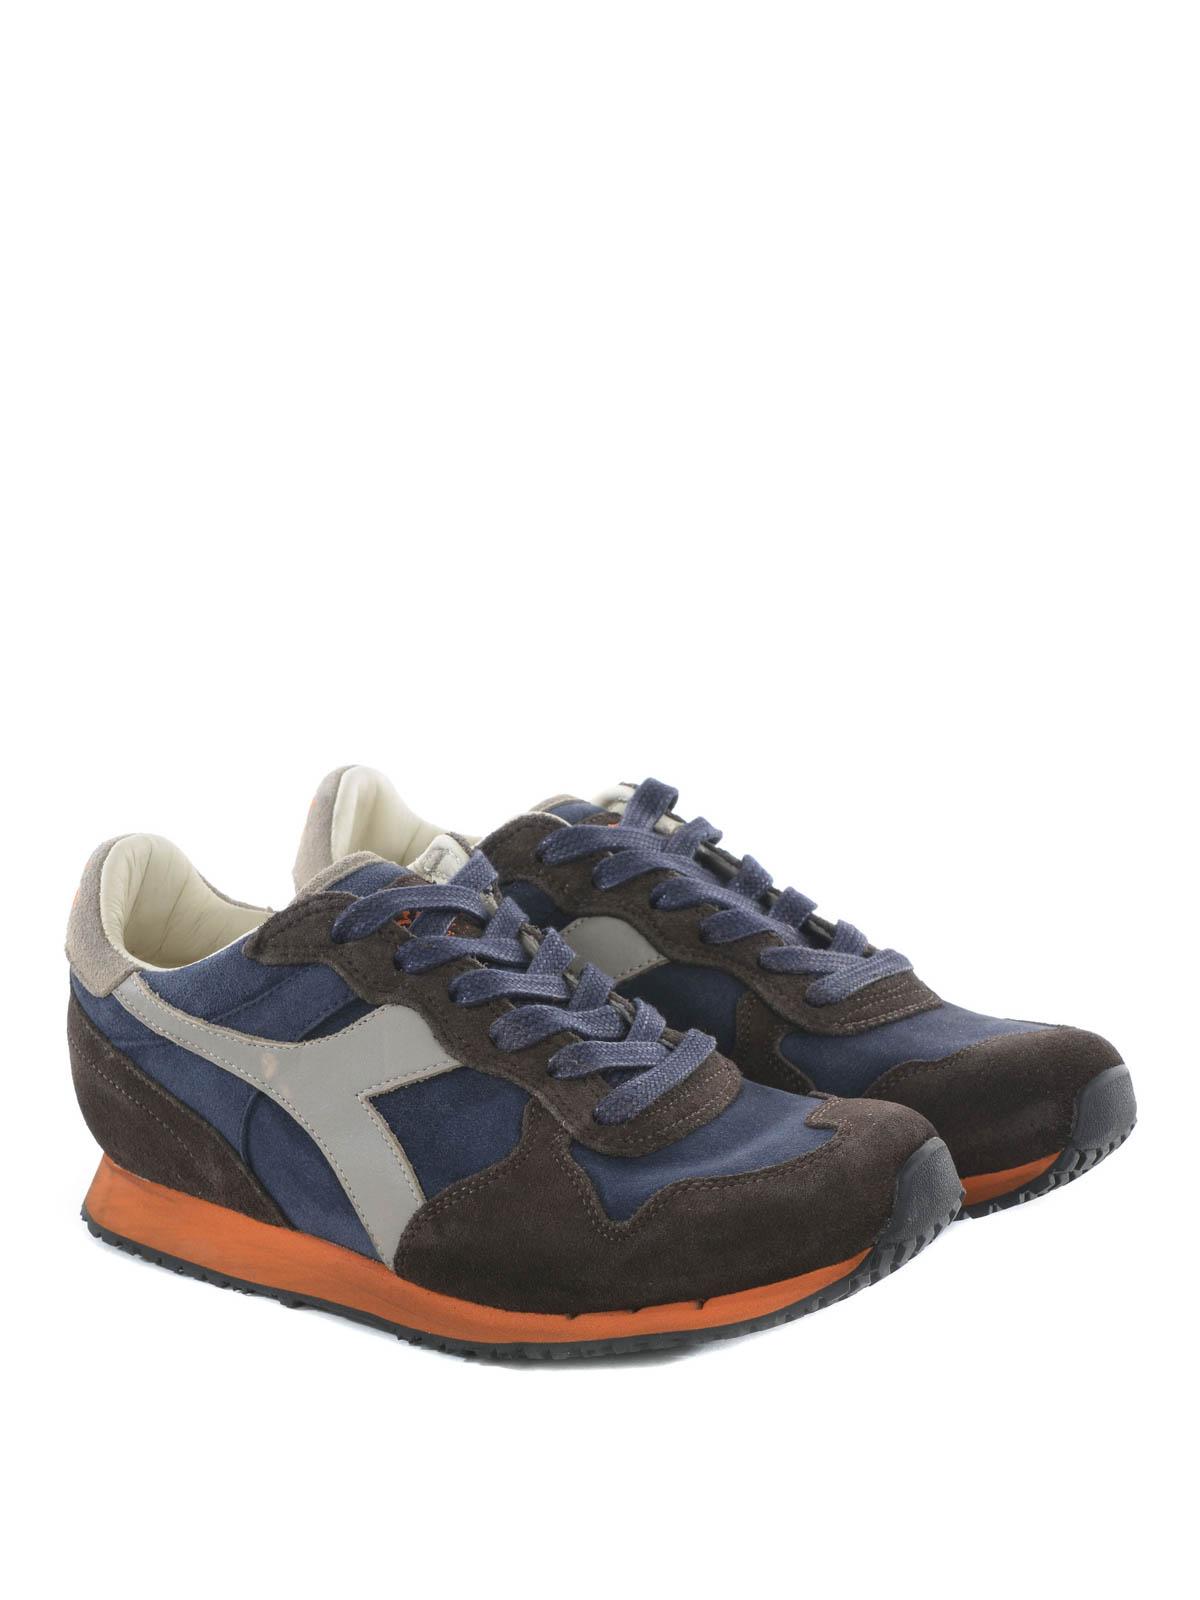 Diadora Heritage - Trident S SW sneakers - trainers - 157664 C5076 367244c961d